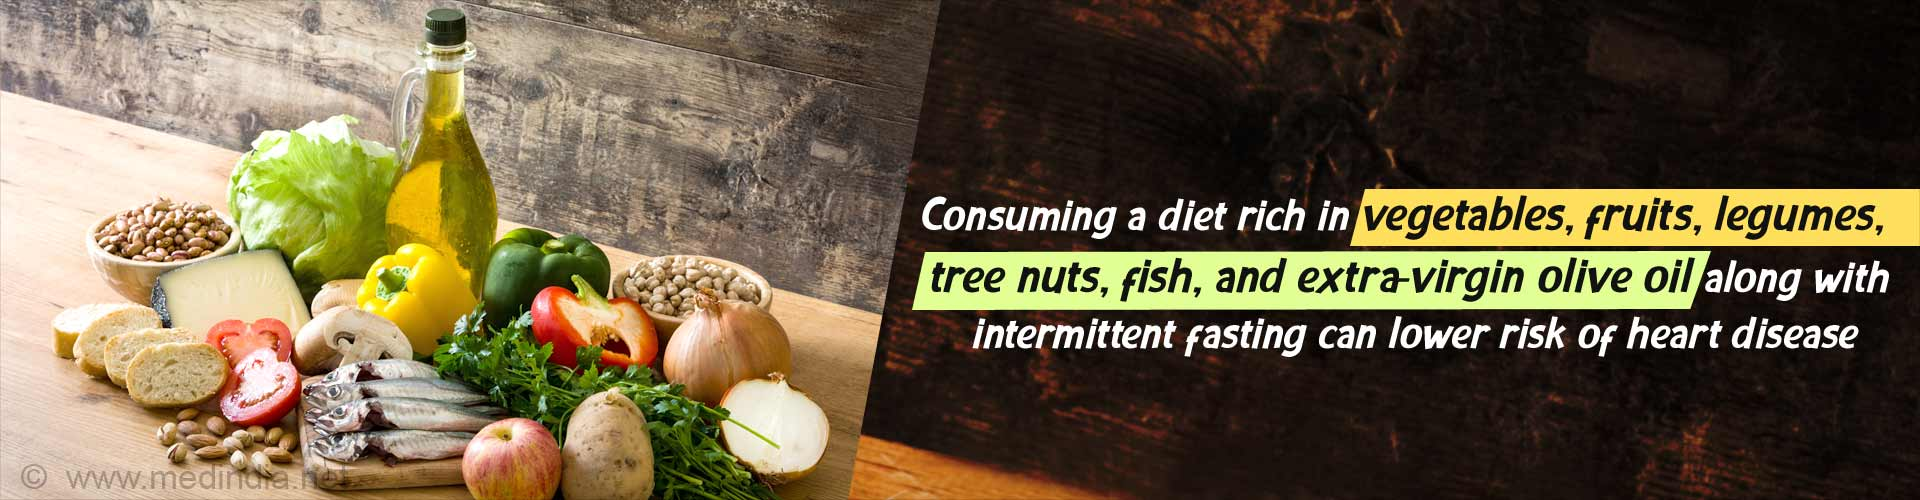 Pesco-Mediterranean Diet Reduces Heart Disease Risk